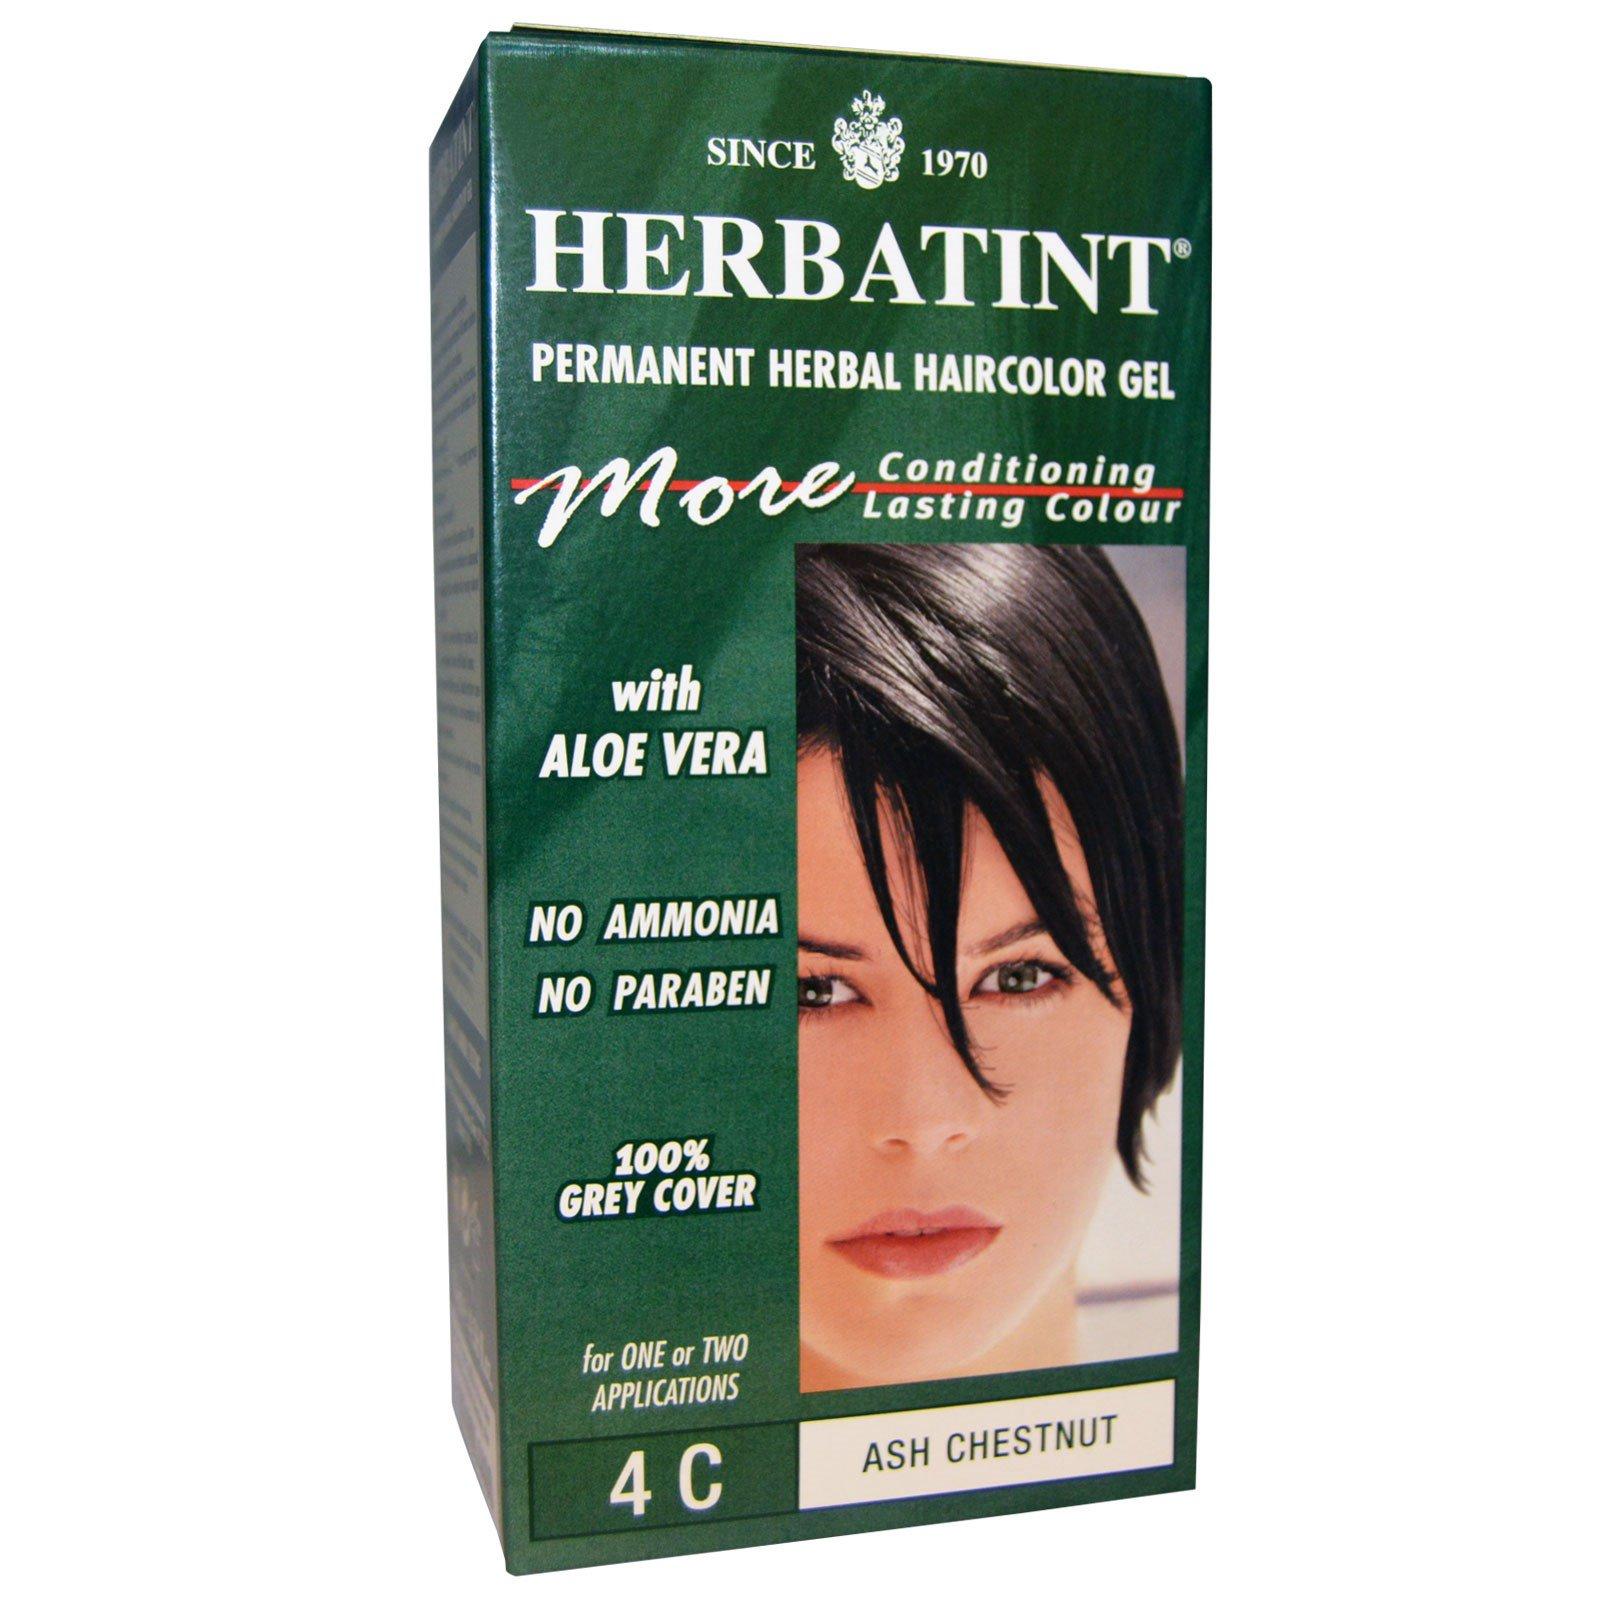 Herbatint, Permanent Herbal Haircolor Gel, 4C, Ash Chestnut, 4.56 fl ...